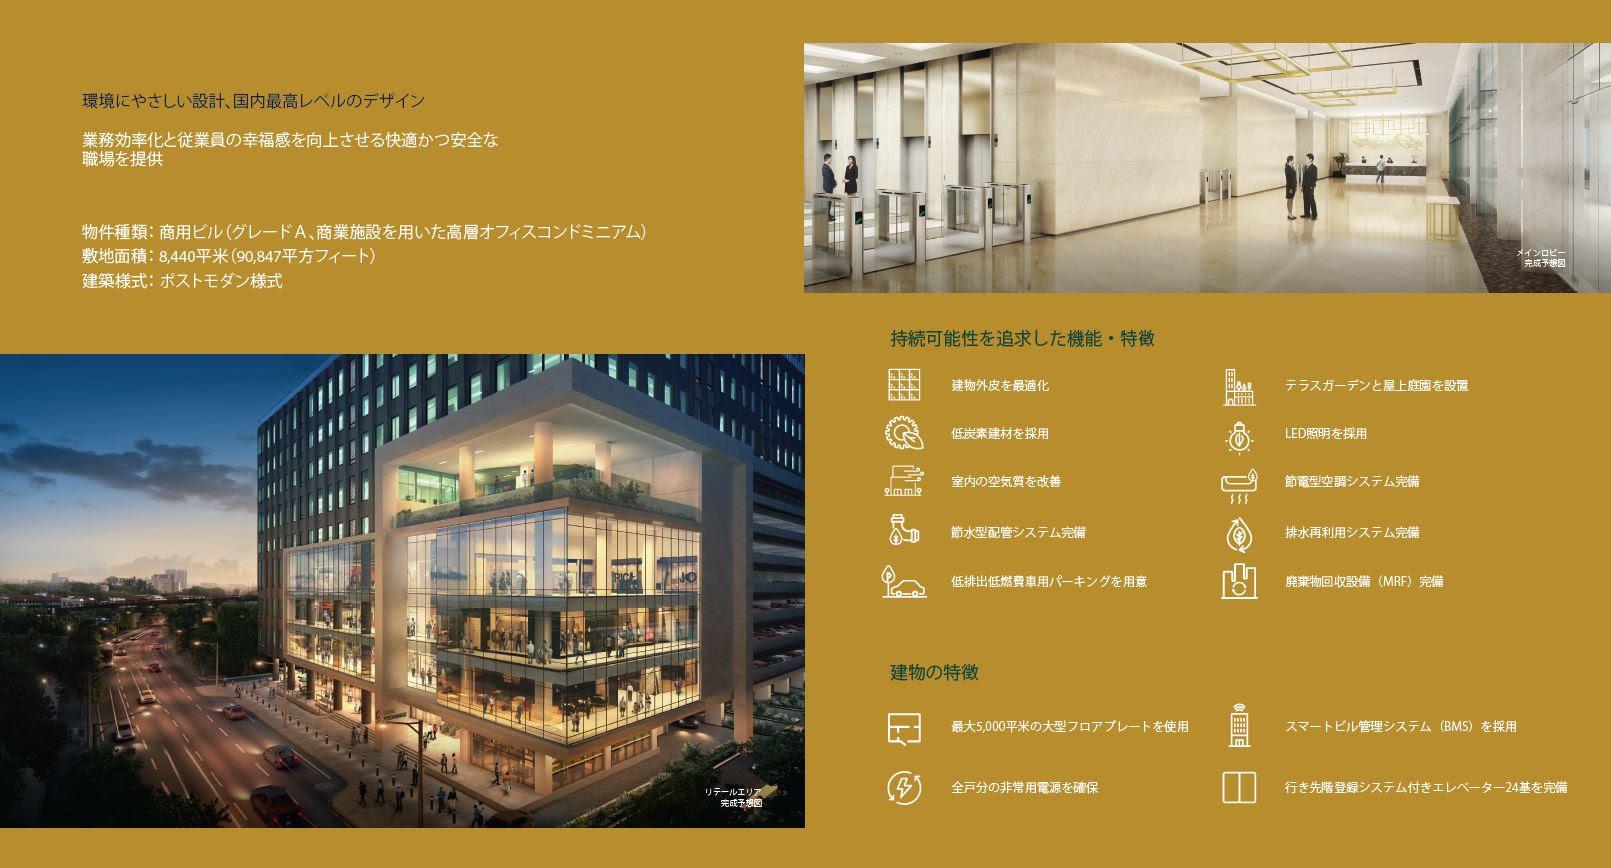 Cebu Exchange 日本語資料④